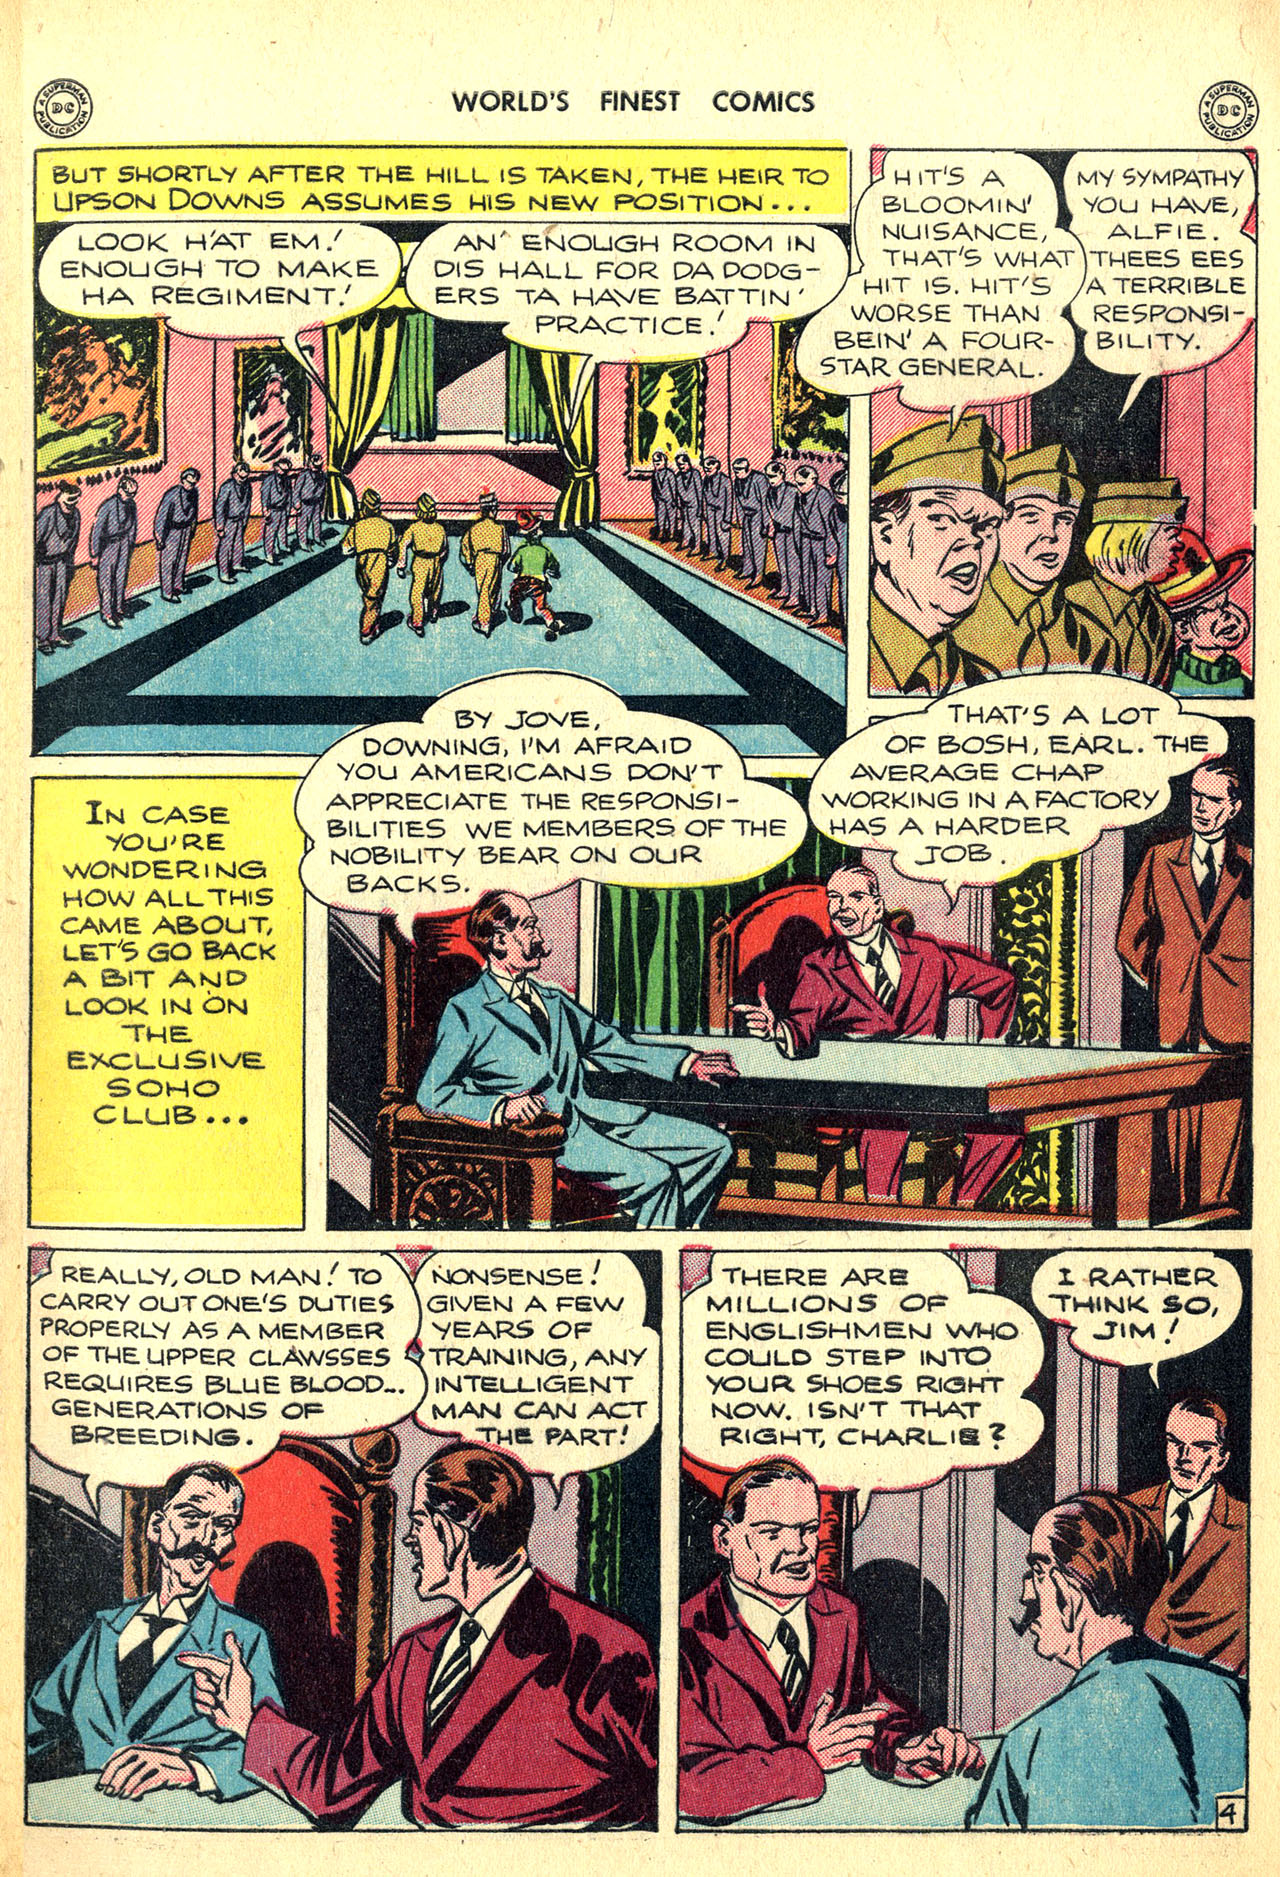 Read online World's Finest Comics comic -  Issue #18 - 39